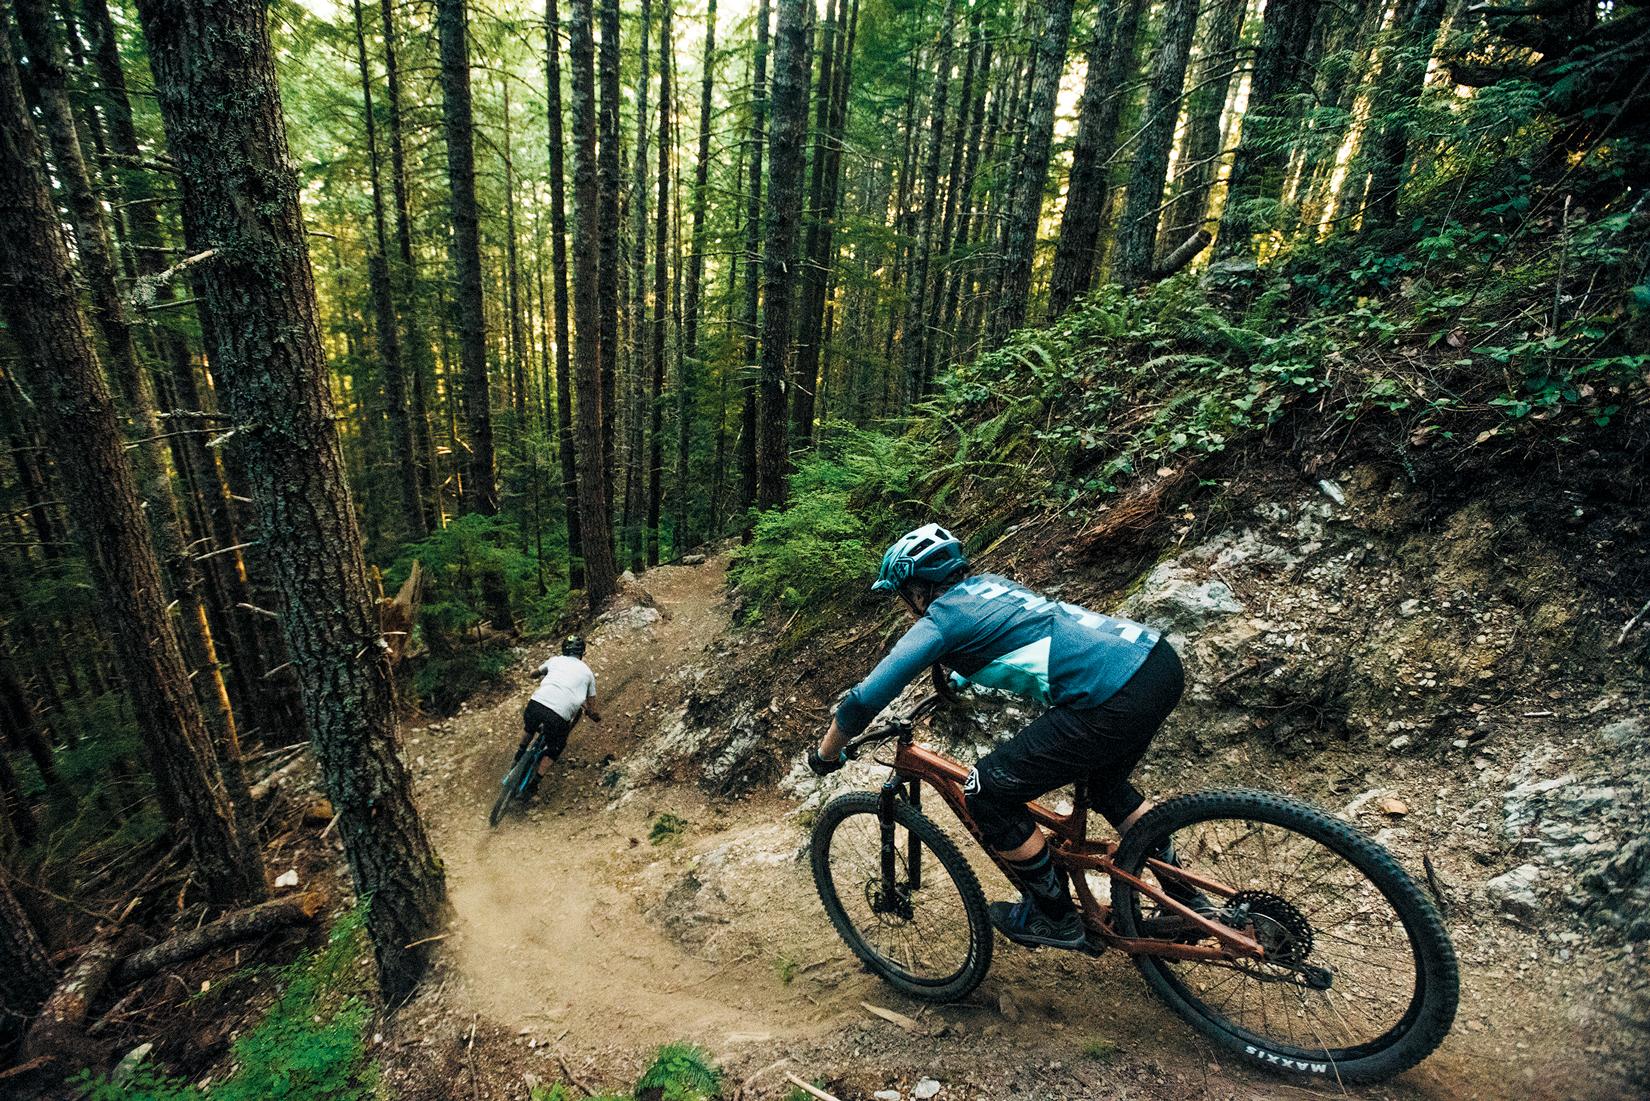 картинки велосипедиста в лесу сердца